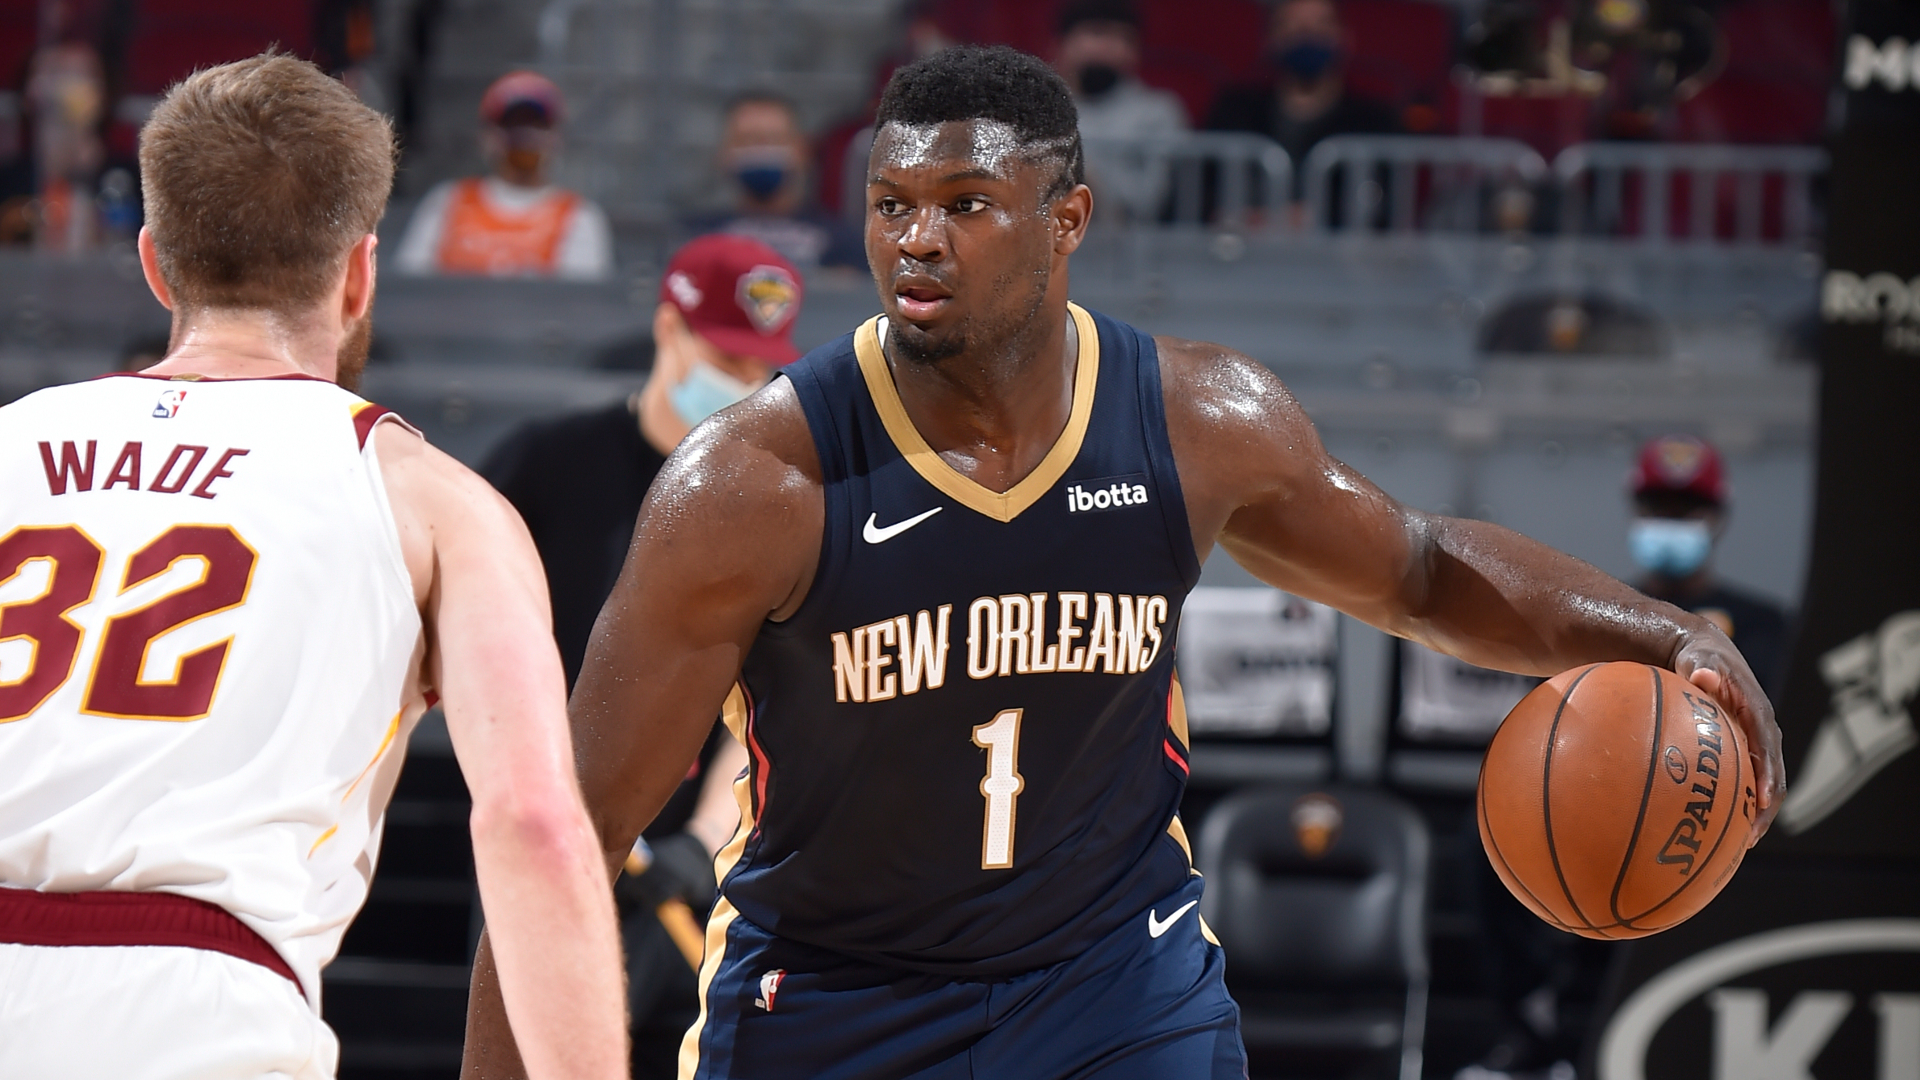 Game Recap Highlights: Pelicans 116, Cavaliers 109